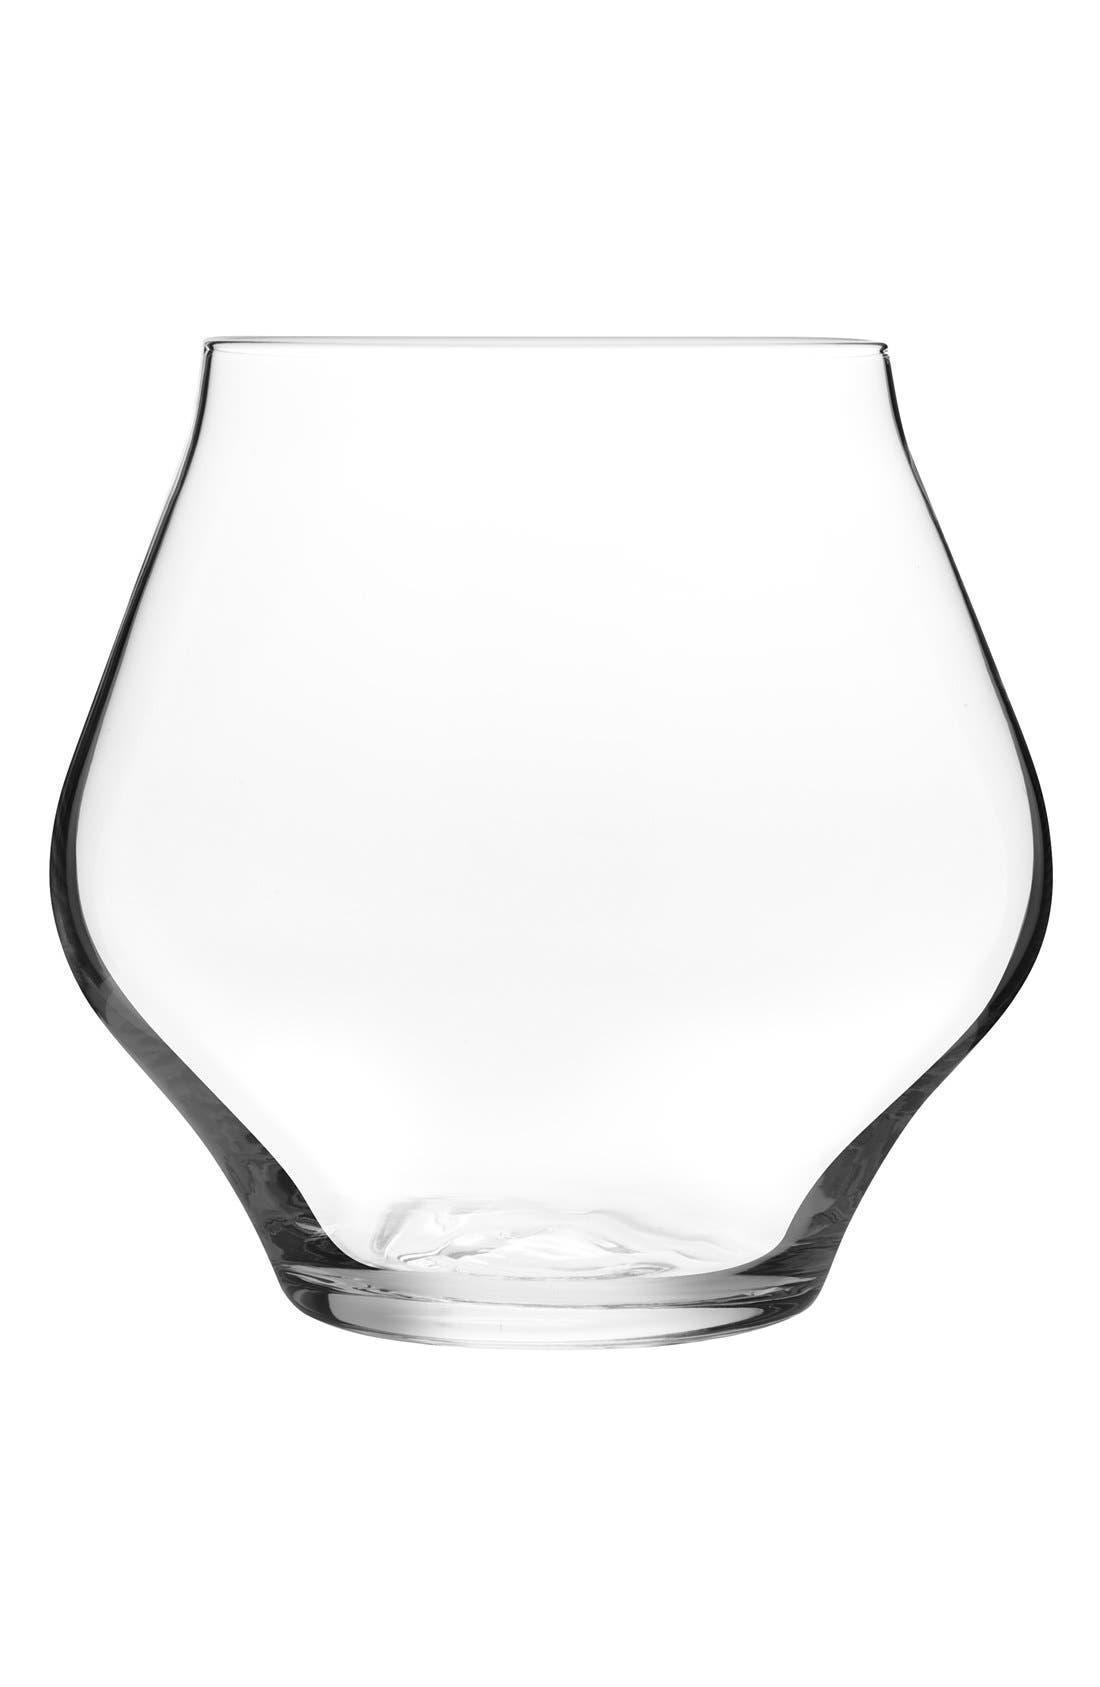 Main Image - Luigi Bormioli Set of 2 Stemless Wine Glasses